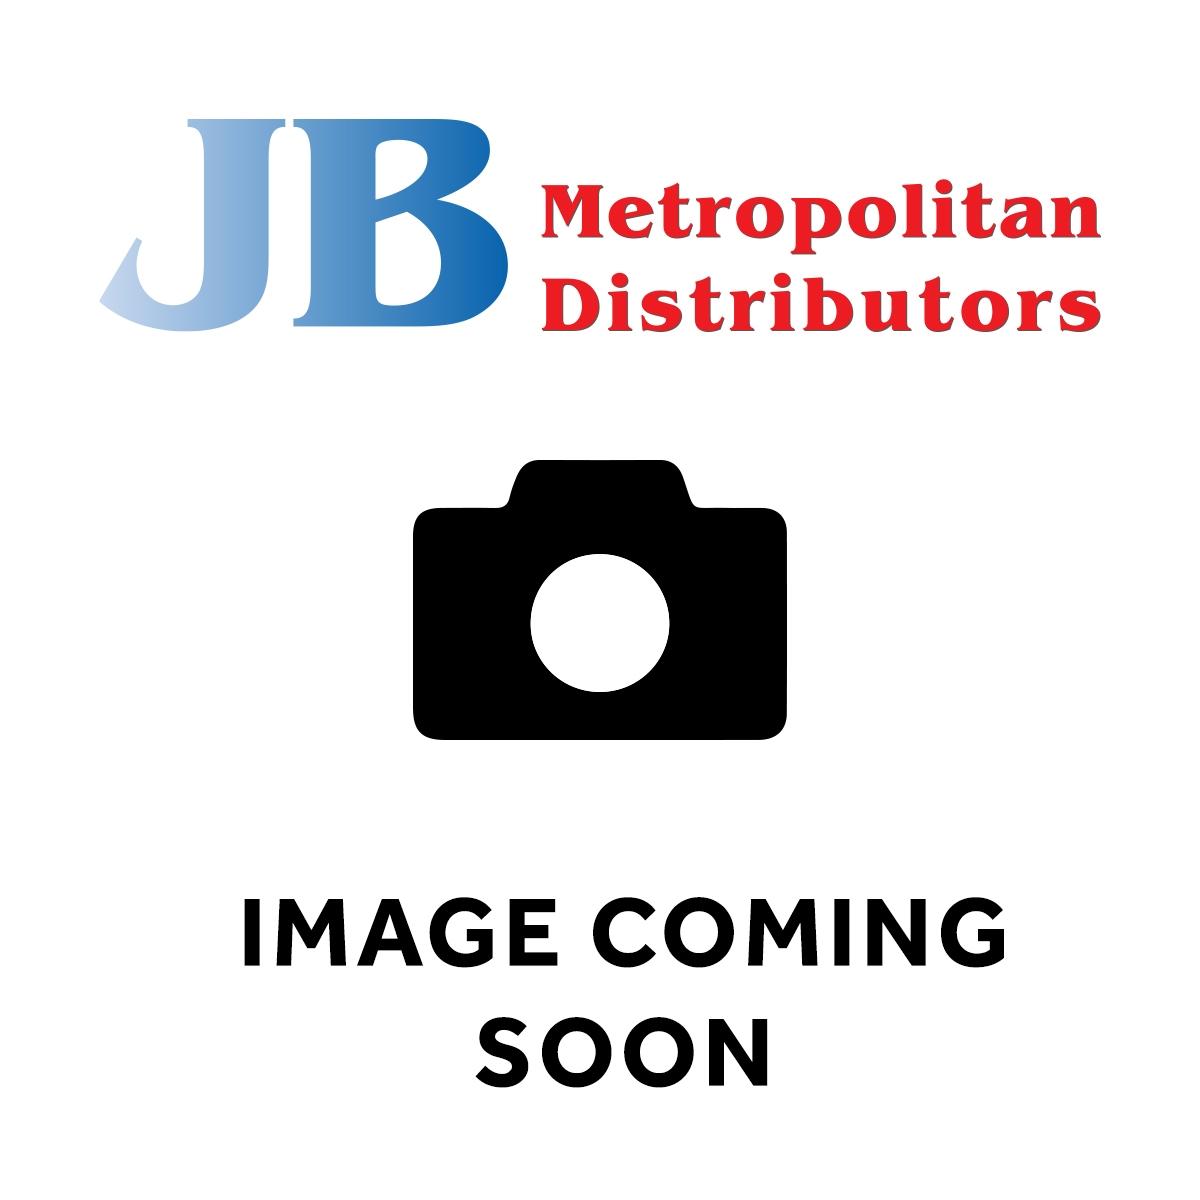 CADBURY MARVELLOUS CREATION SPIDER RASPBERRY 170G (15)